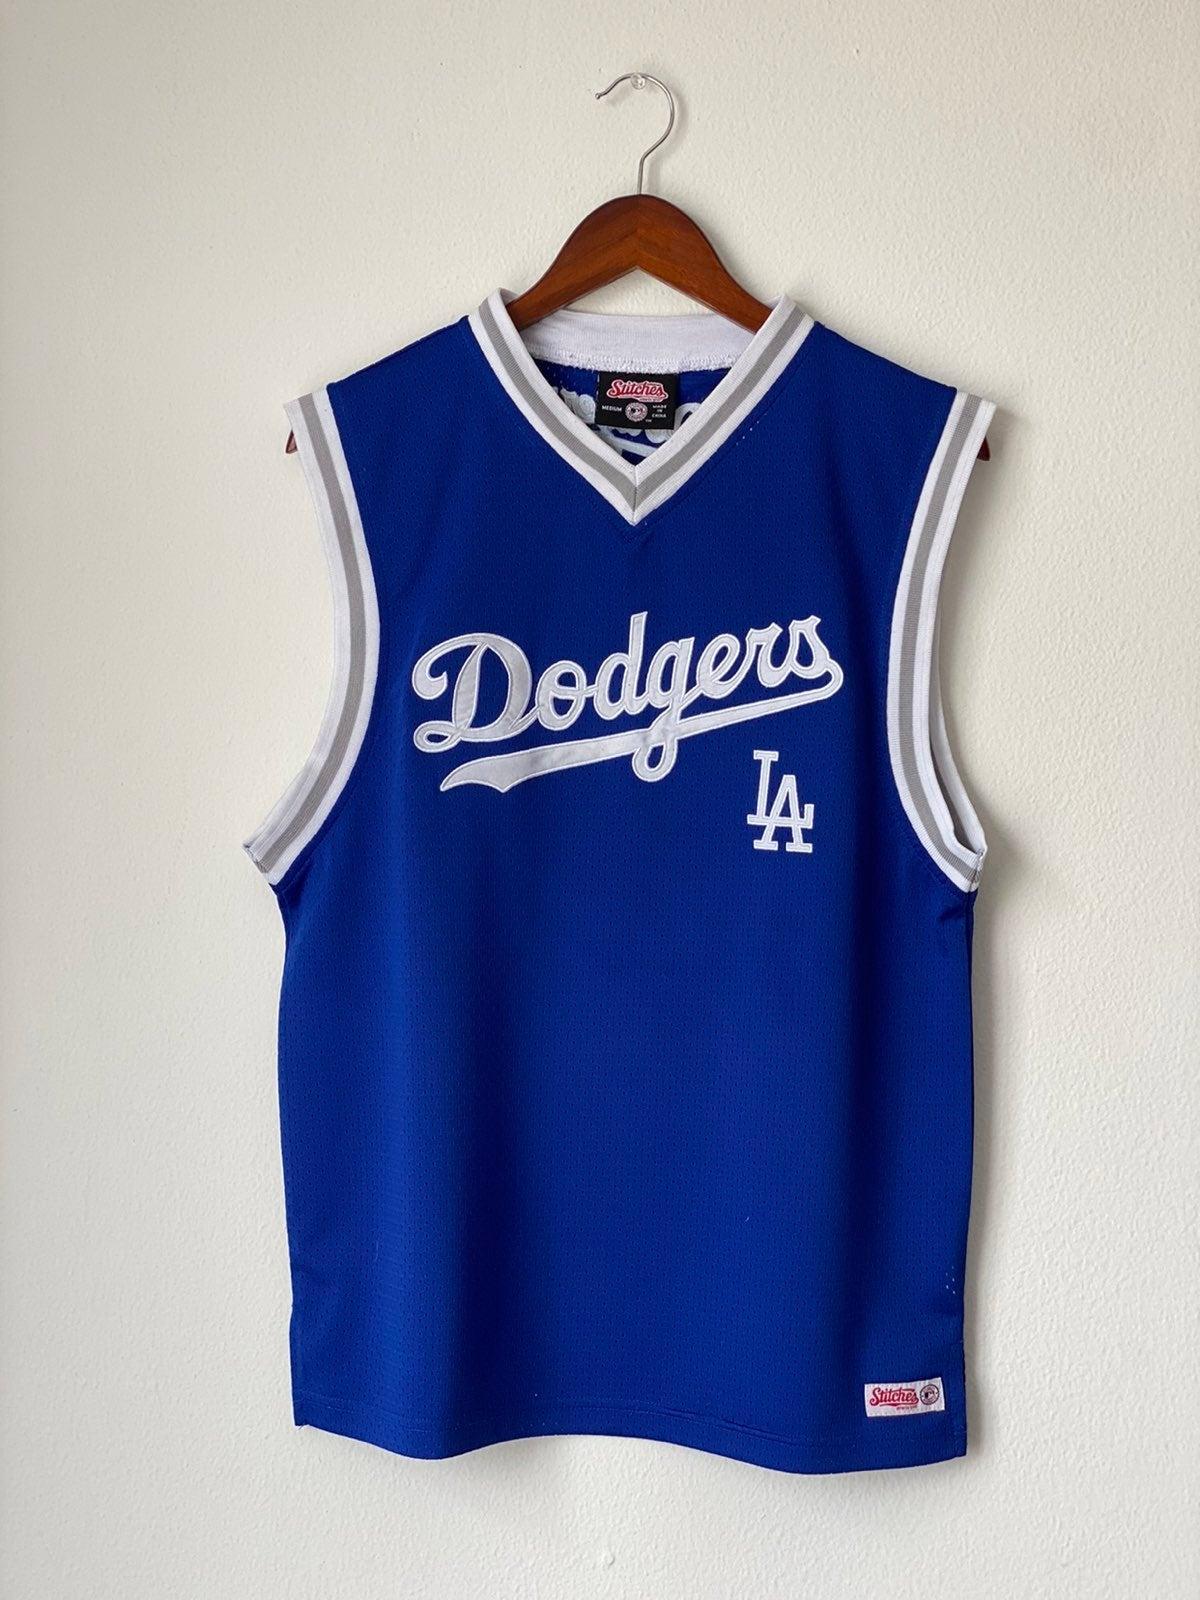 Stitches Los Angeles Dodgers Jersey Sz M